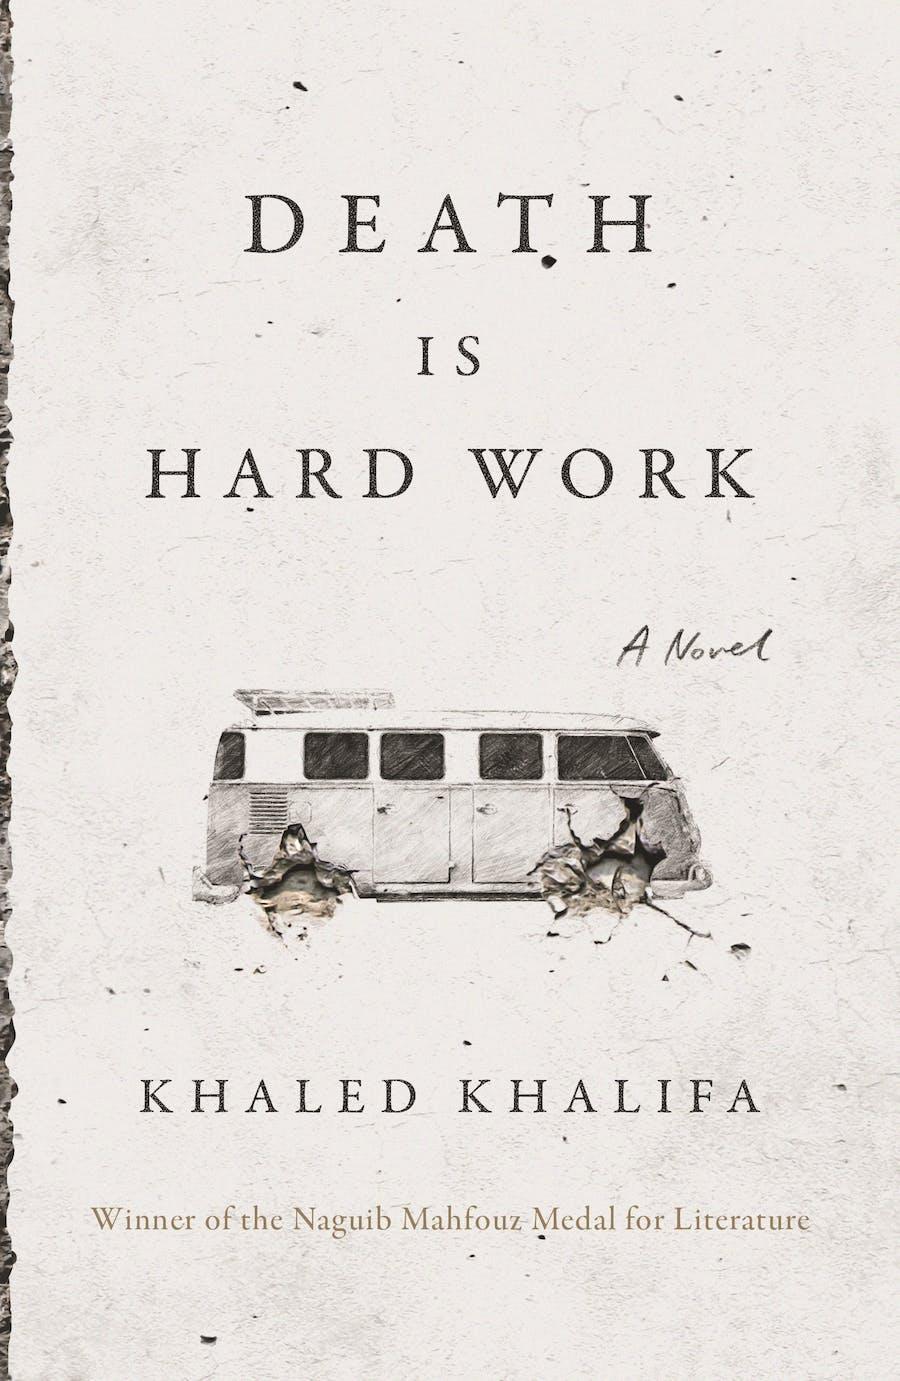 Death is Hard Work by Khaled Khalifa; Translated from Arabic by Leri Price